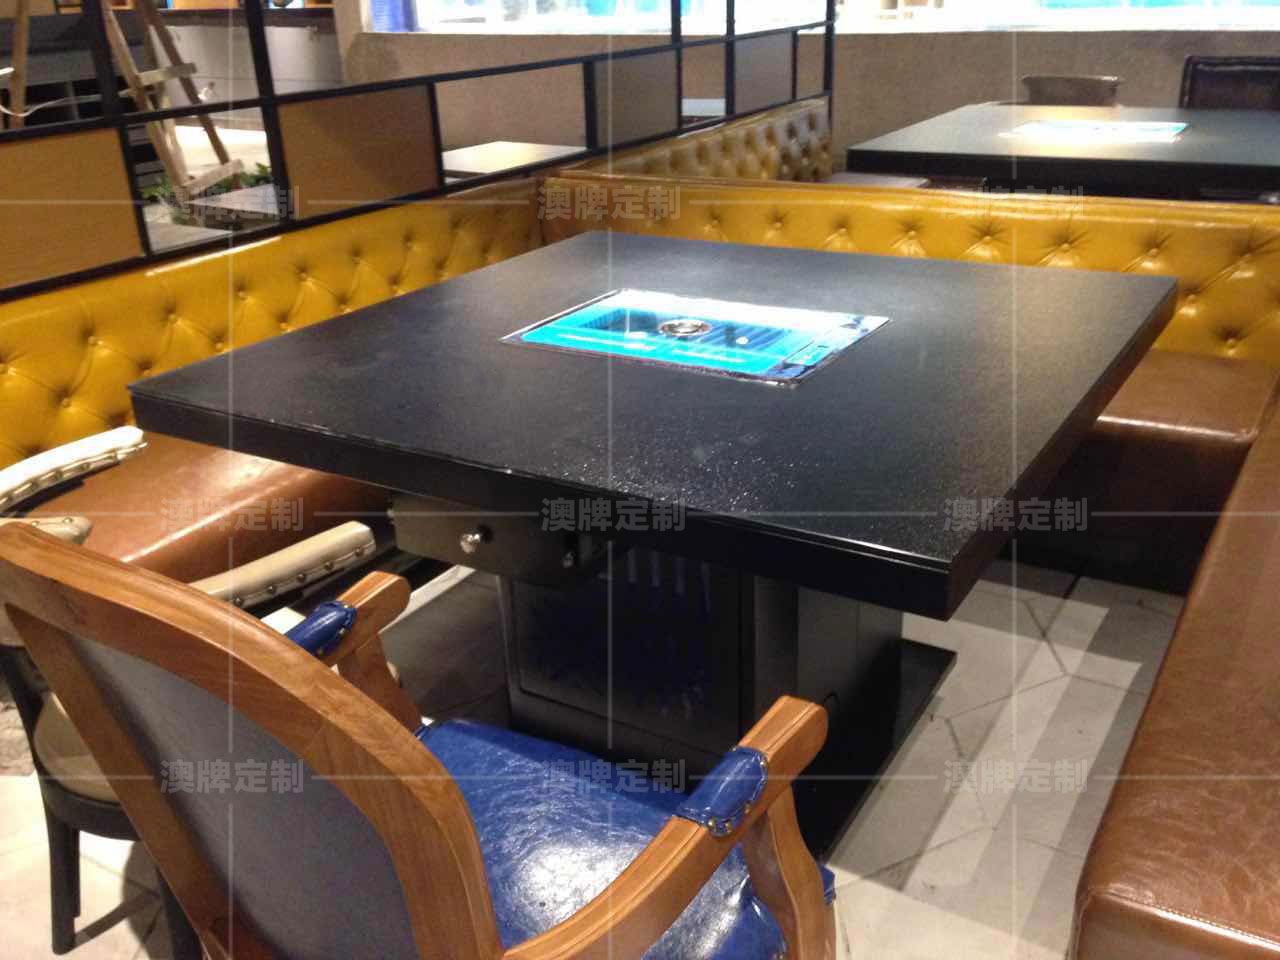 Z67B防滑玻璃类似雷竞技这种靠谱的桌+DT28下排烟烤炉.jpg